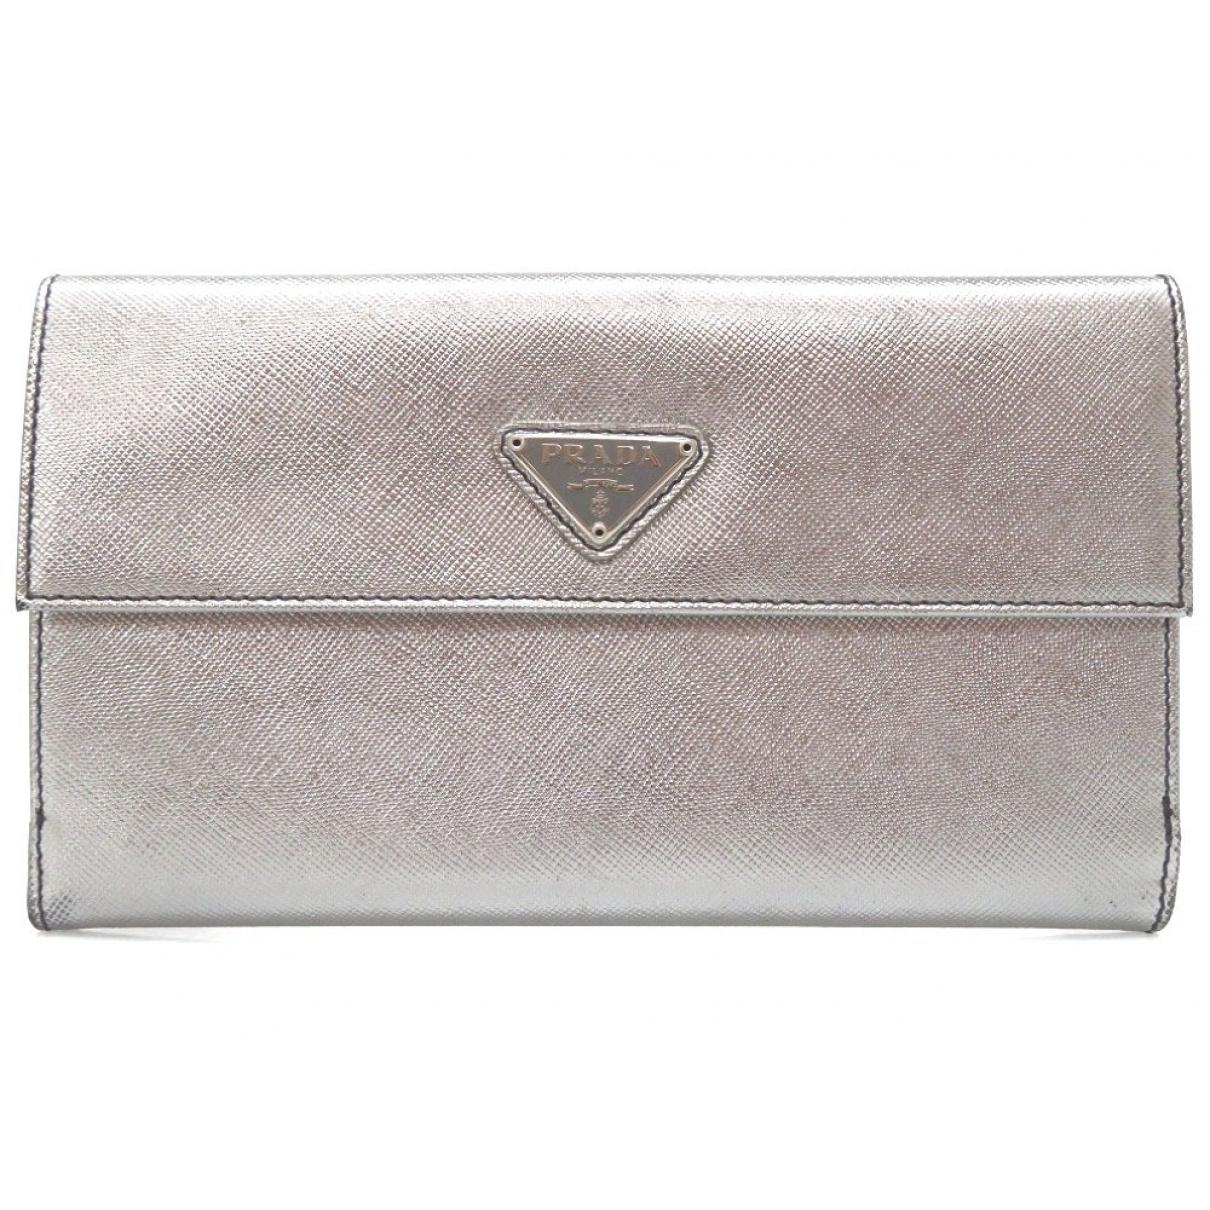 Prada \N Silver Leather wallet for Women \N